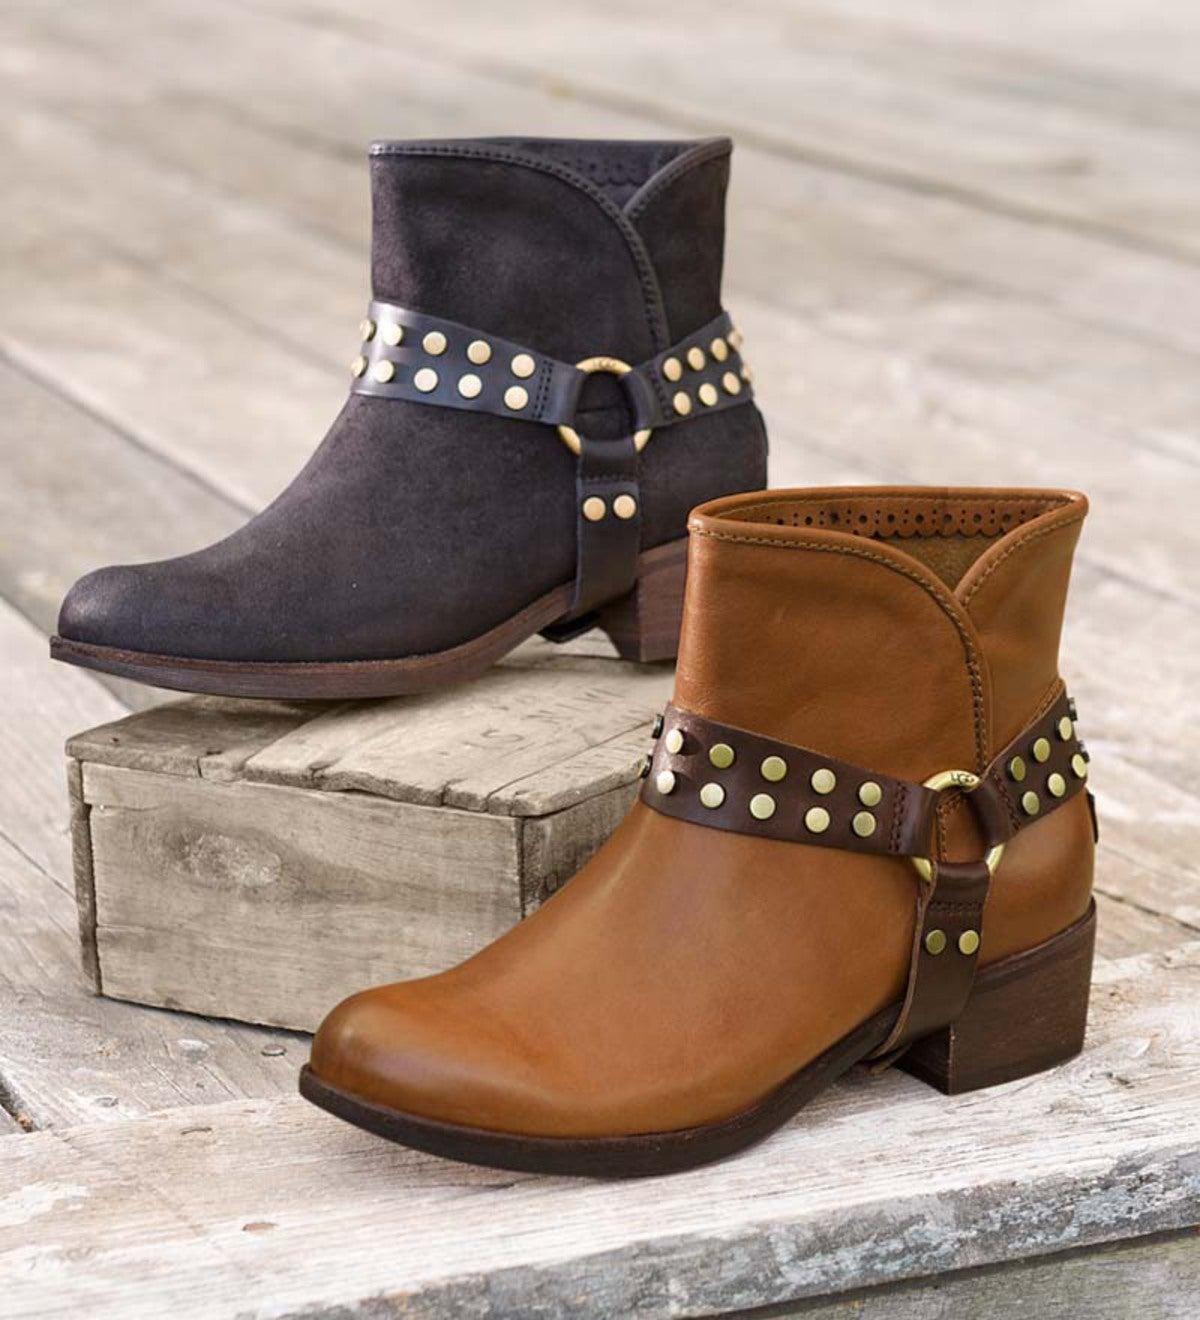 7b4320d65b2 UGG Australia Darling Harness Women's Ankle Boot | PlowHearth